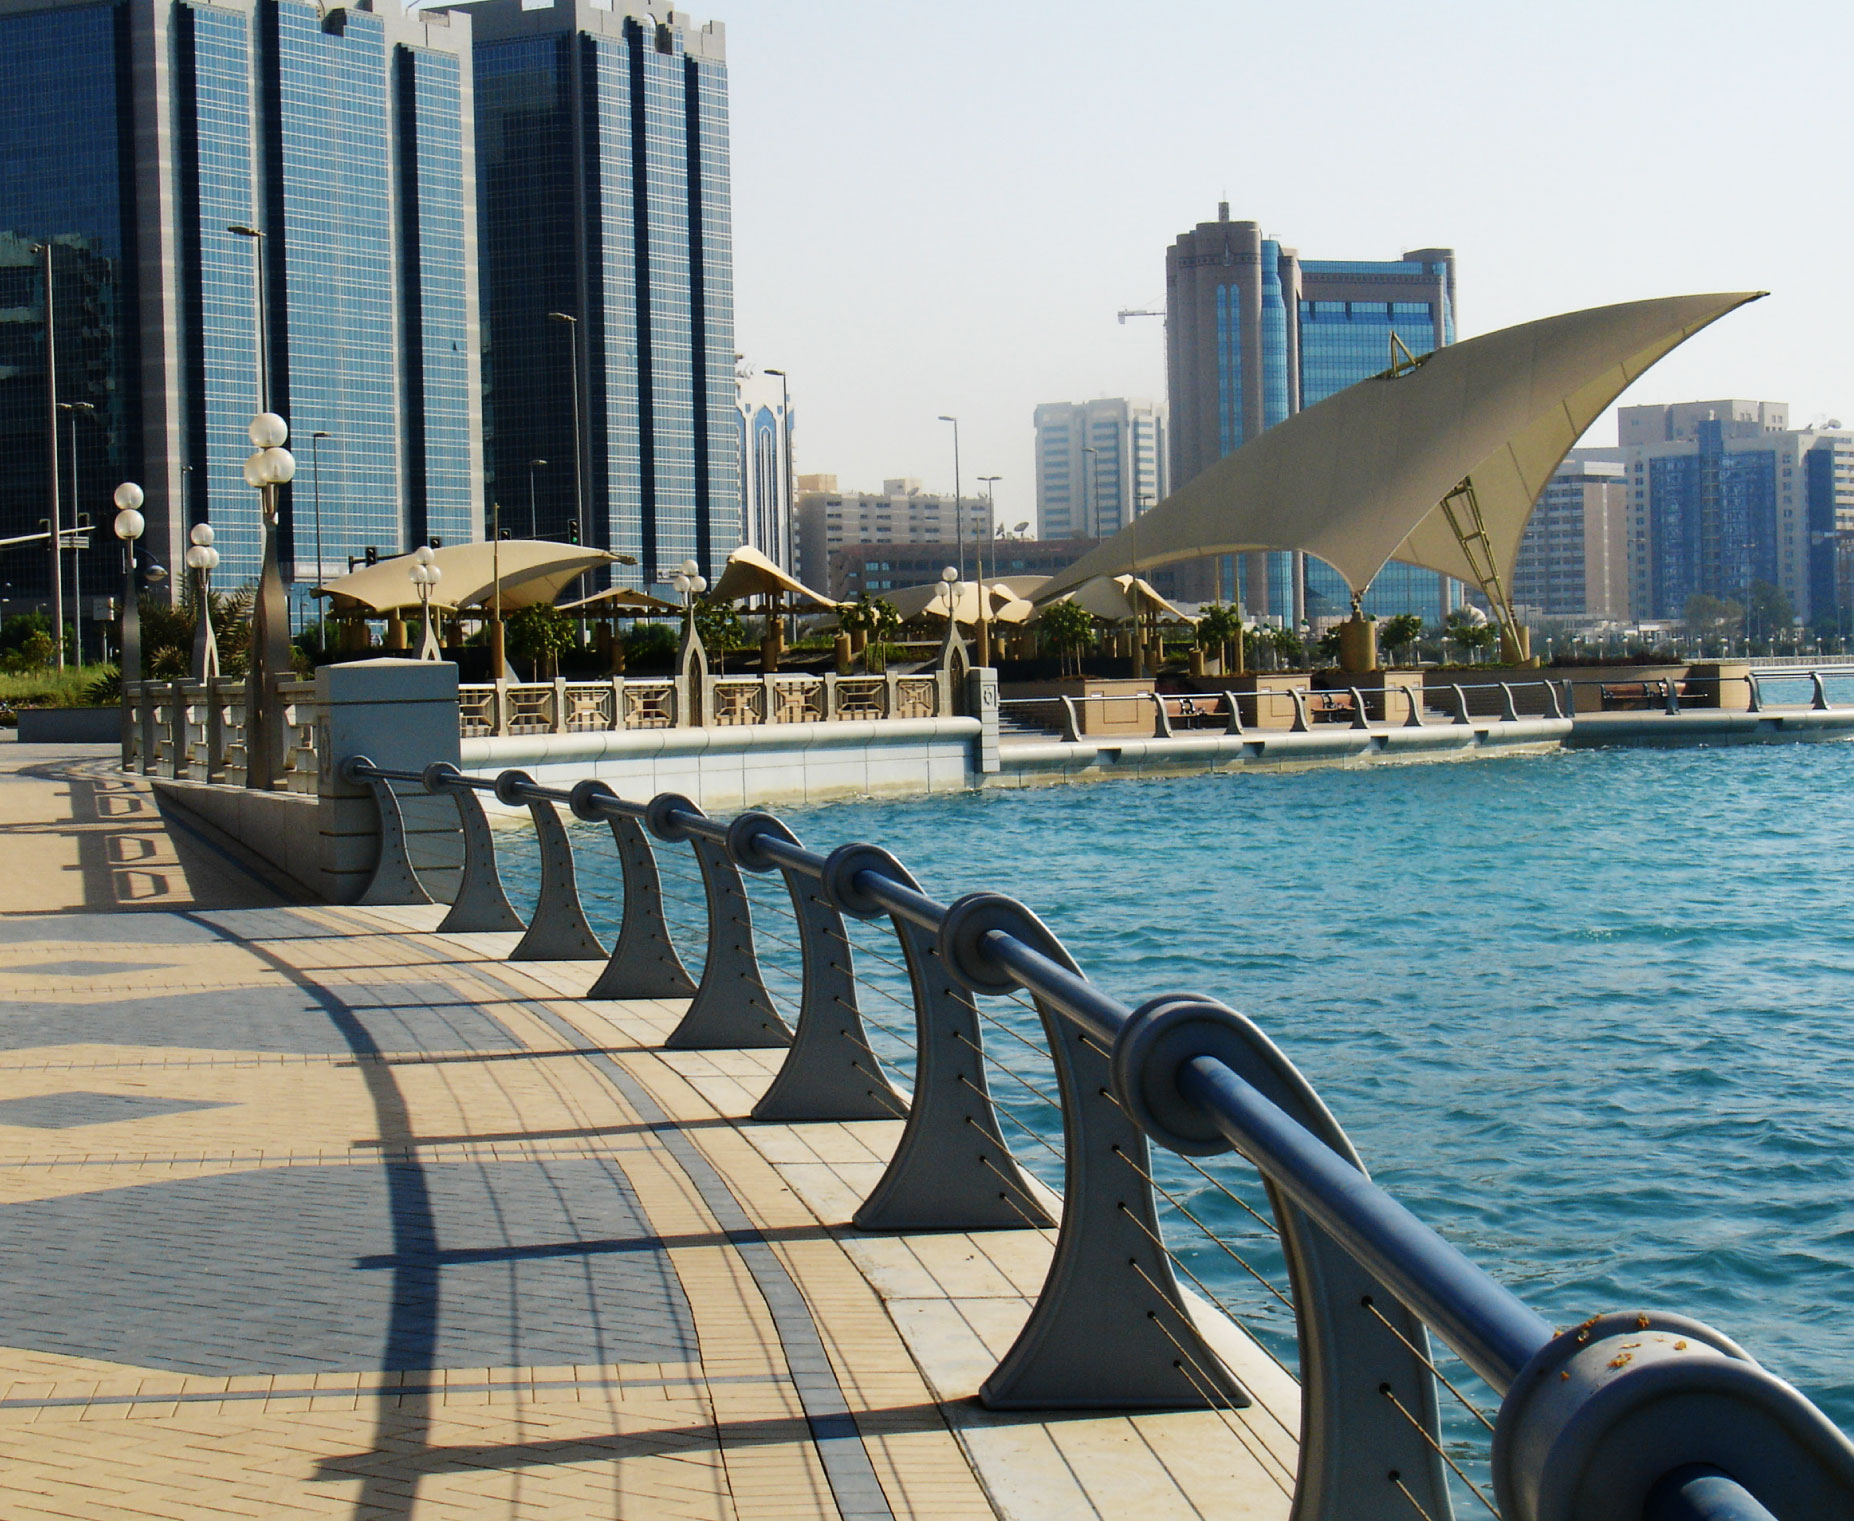 Abu Dhabi Corniche Waterfront 04-01.jpg